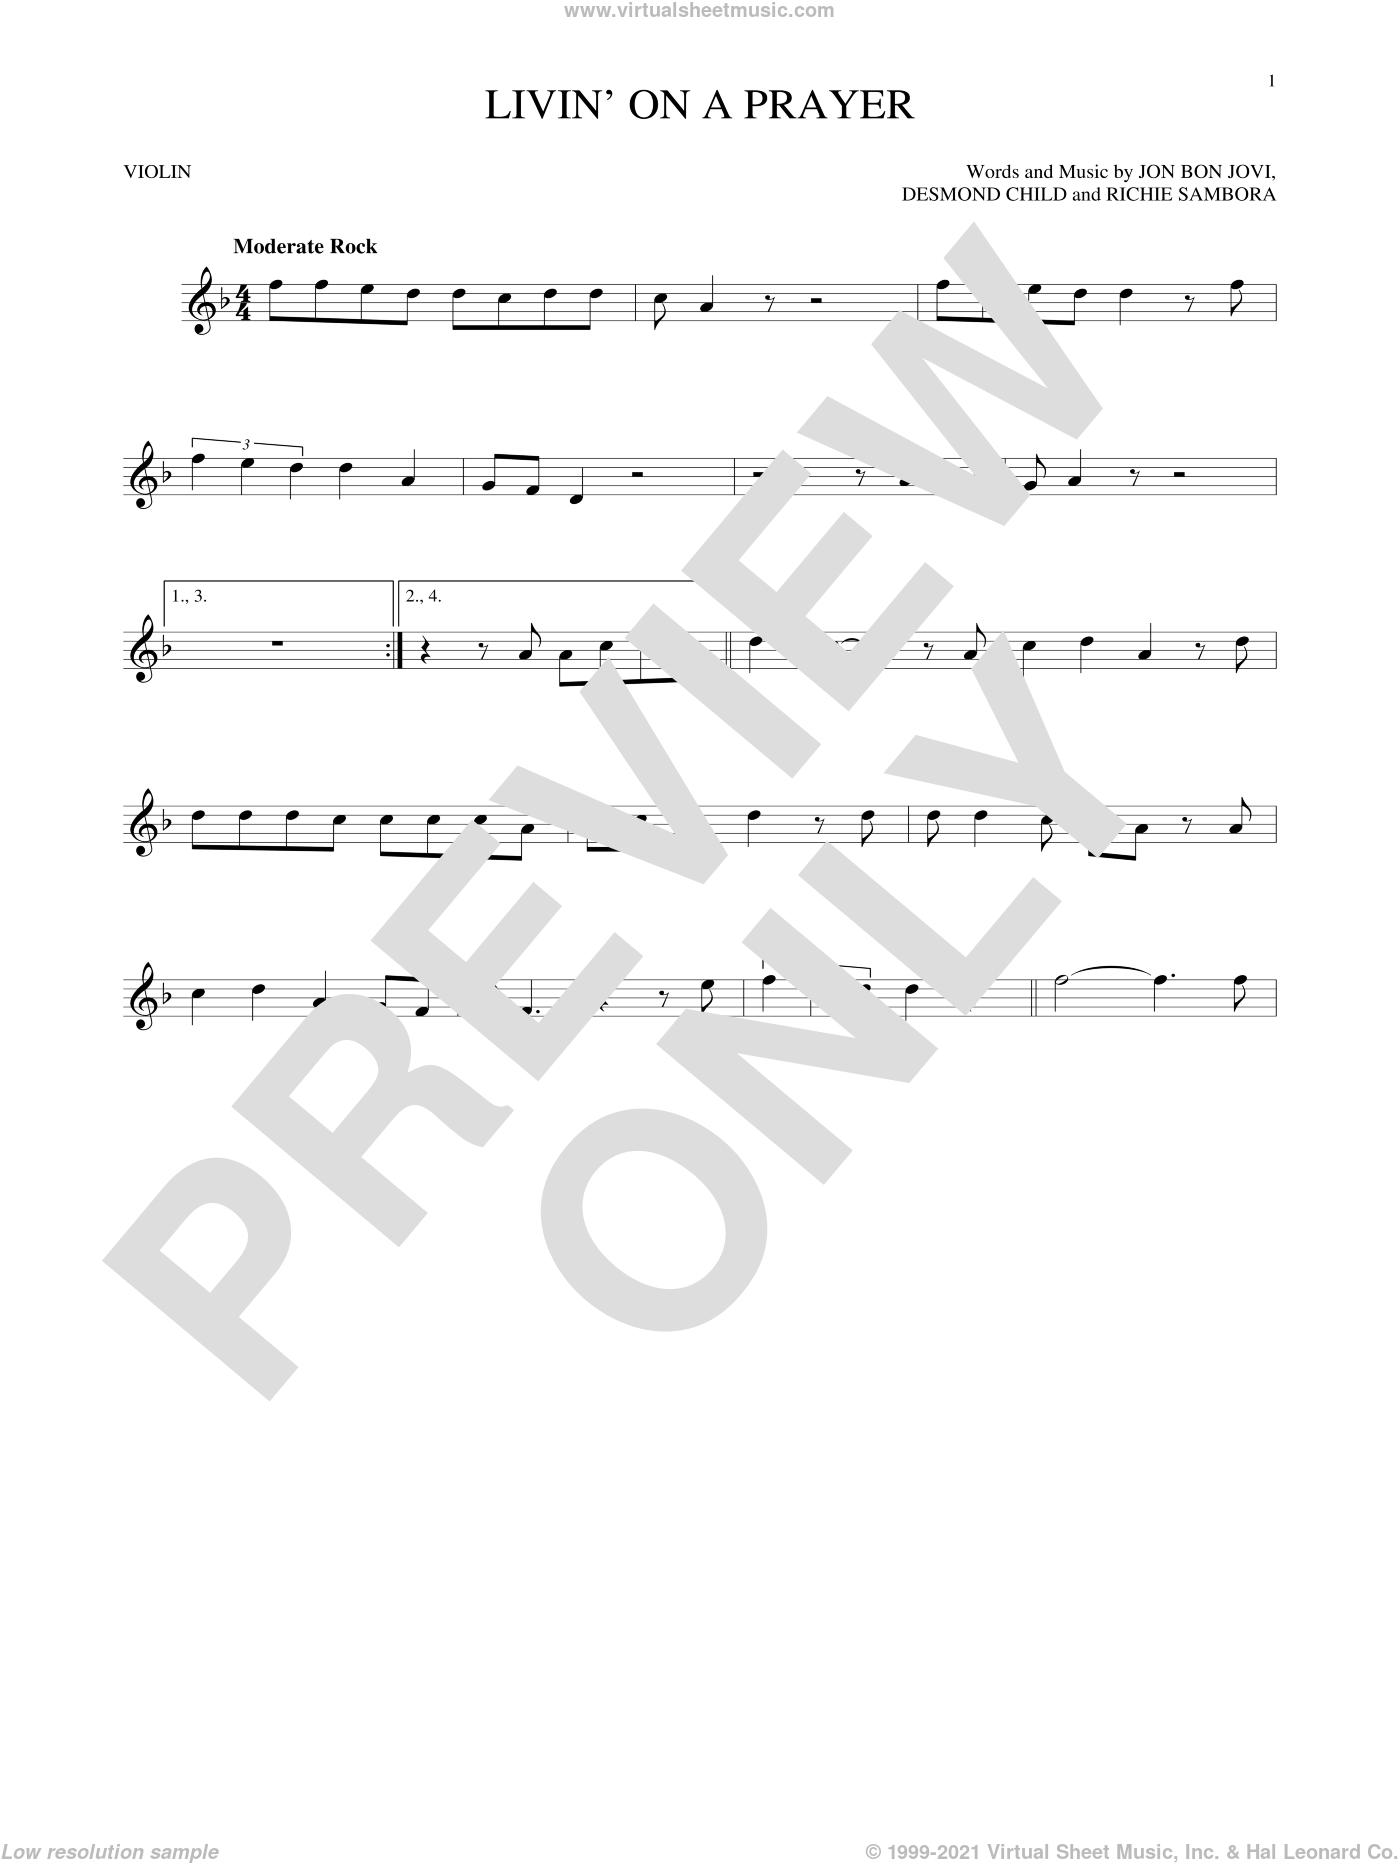 Livin' On A Prayer sheet music for violin solo by Bon Jovi, Desmond Child and Richie Sambora, intermediate skill level